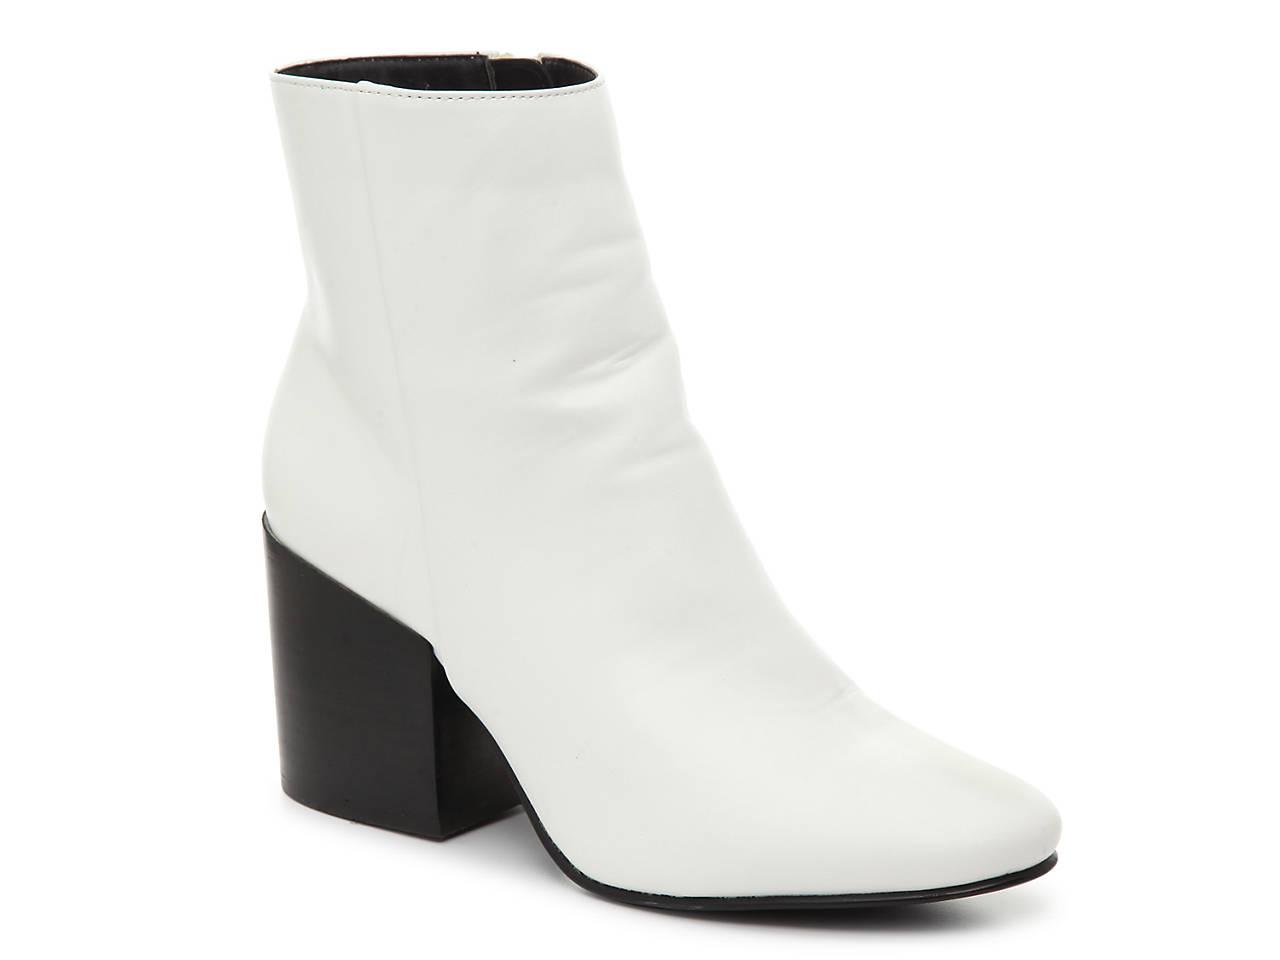 a42d3f5809bc Madden Girl Aaden Bootie Women s Shoes